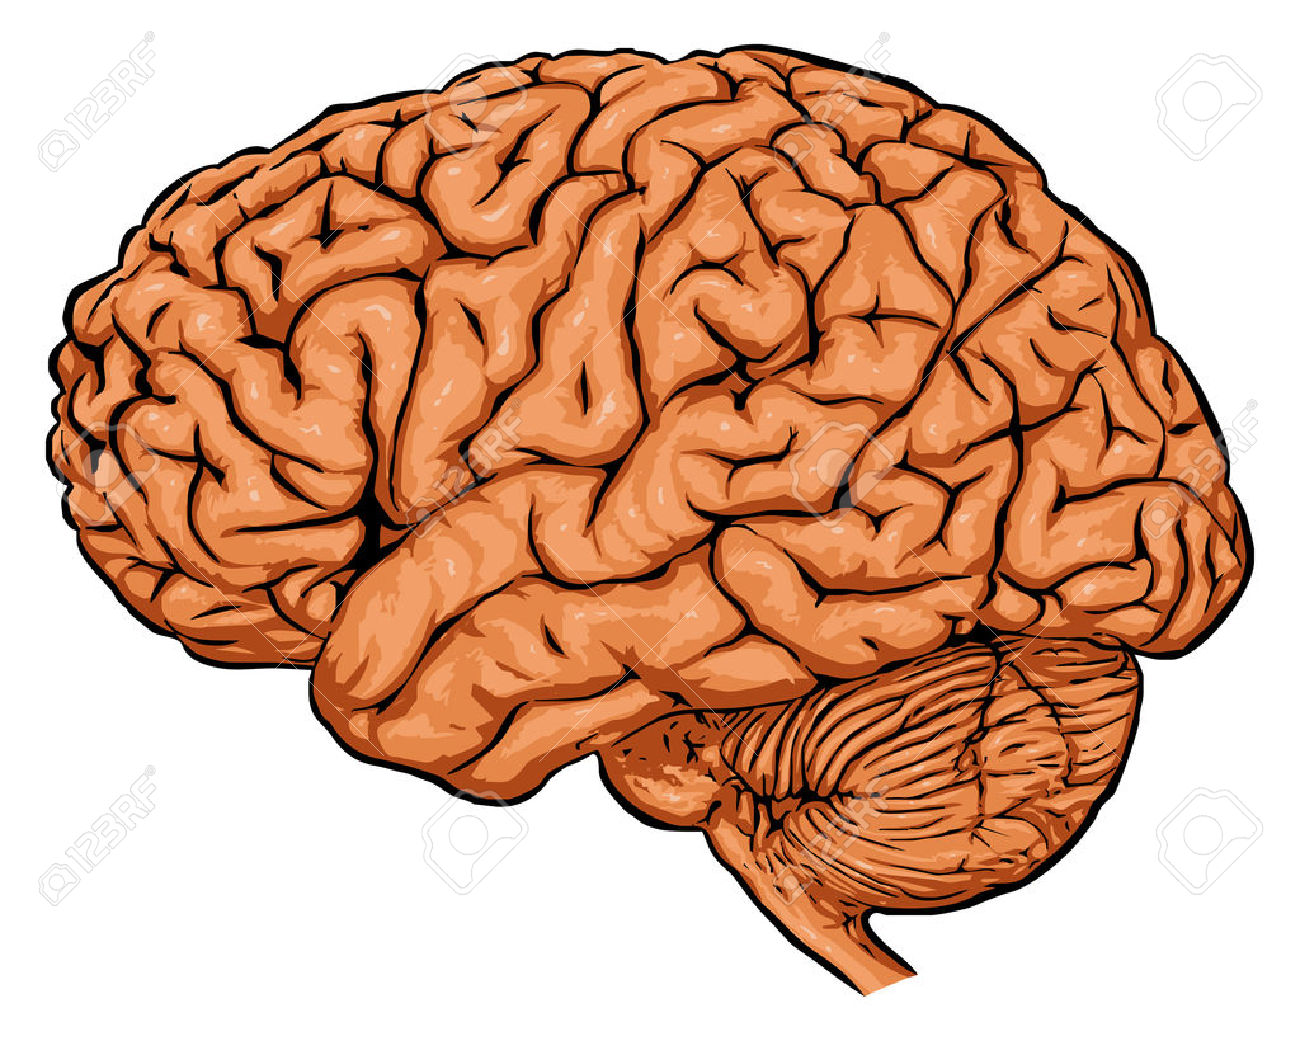 hight resolution of brain clipart brain clipart brain